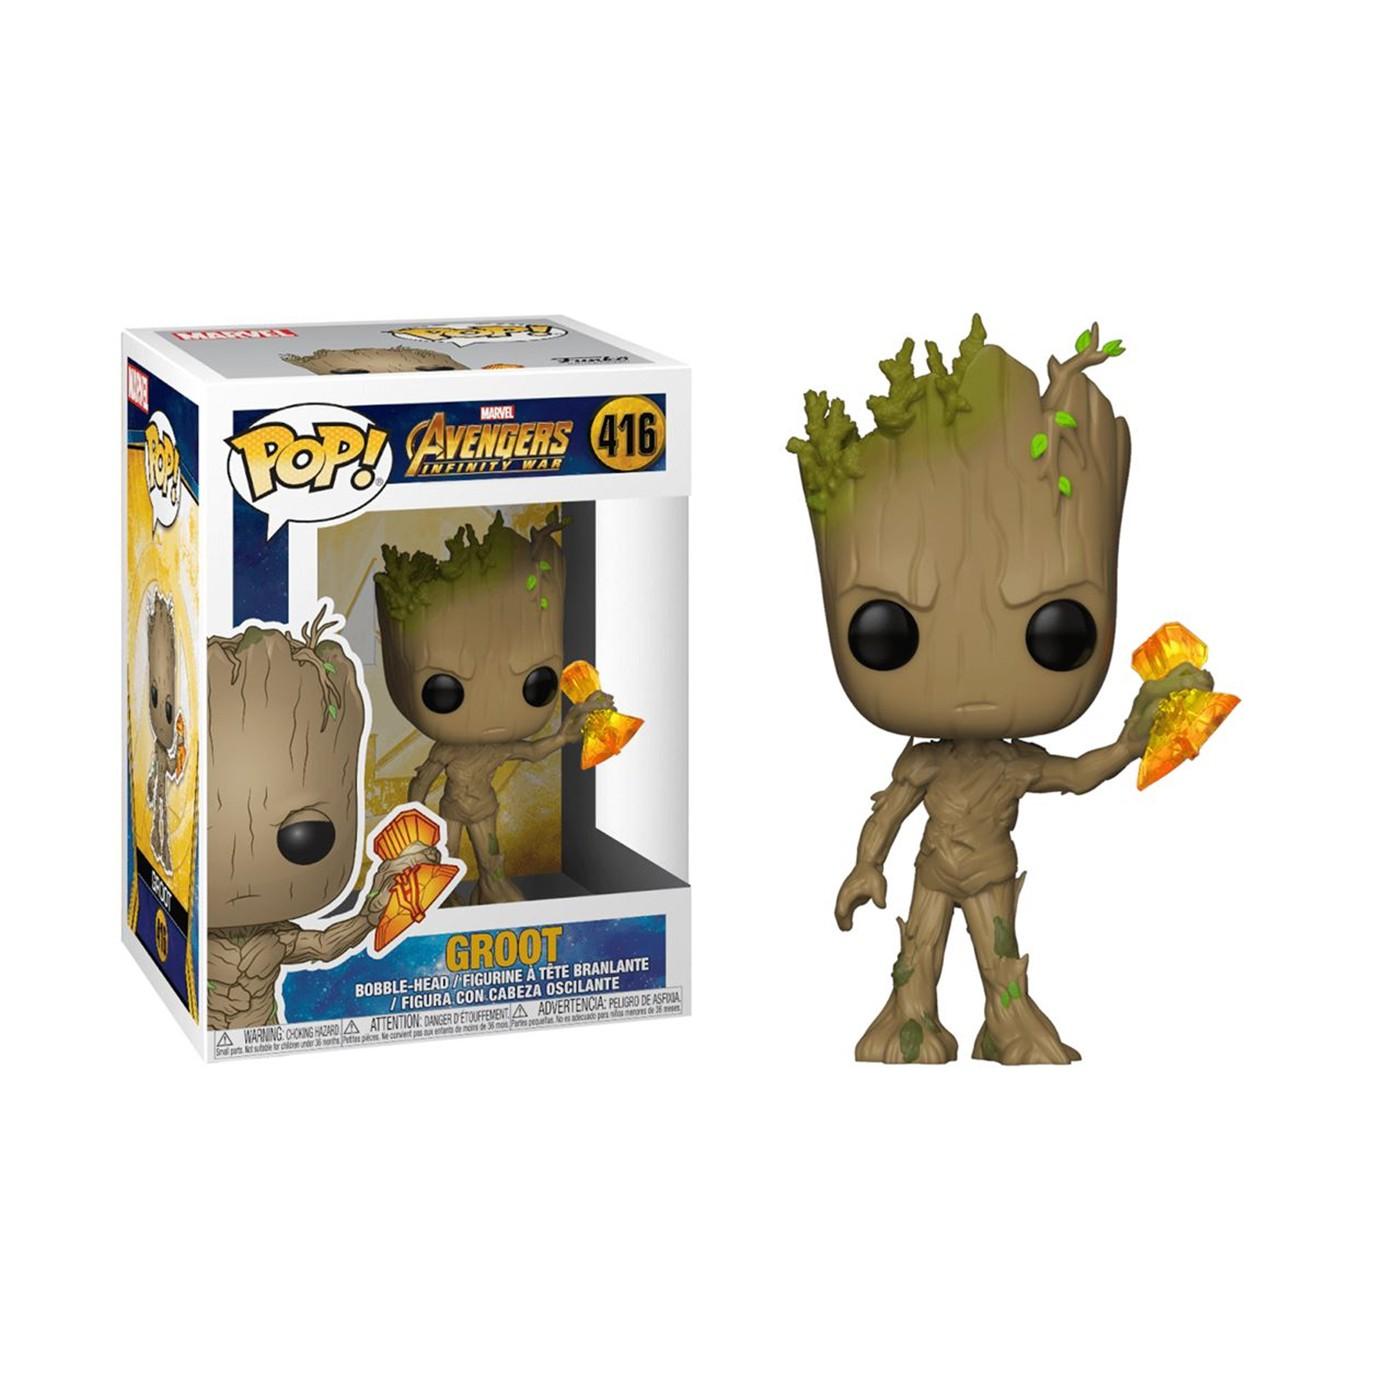 Avengers Infinity War Groot with Stormbreaker Funko Pop Bobble Head